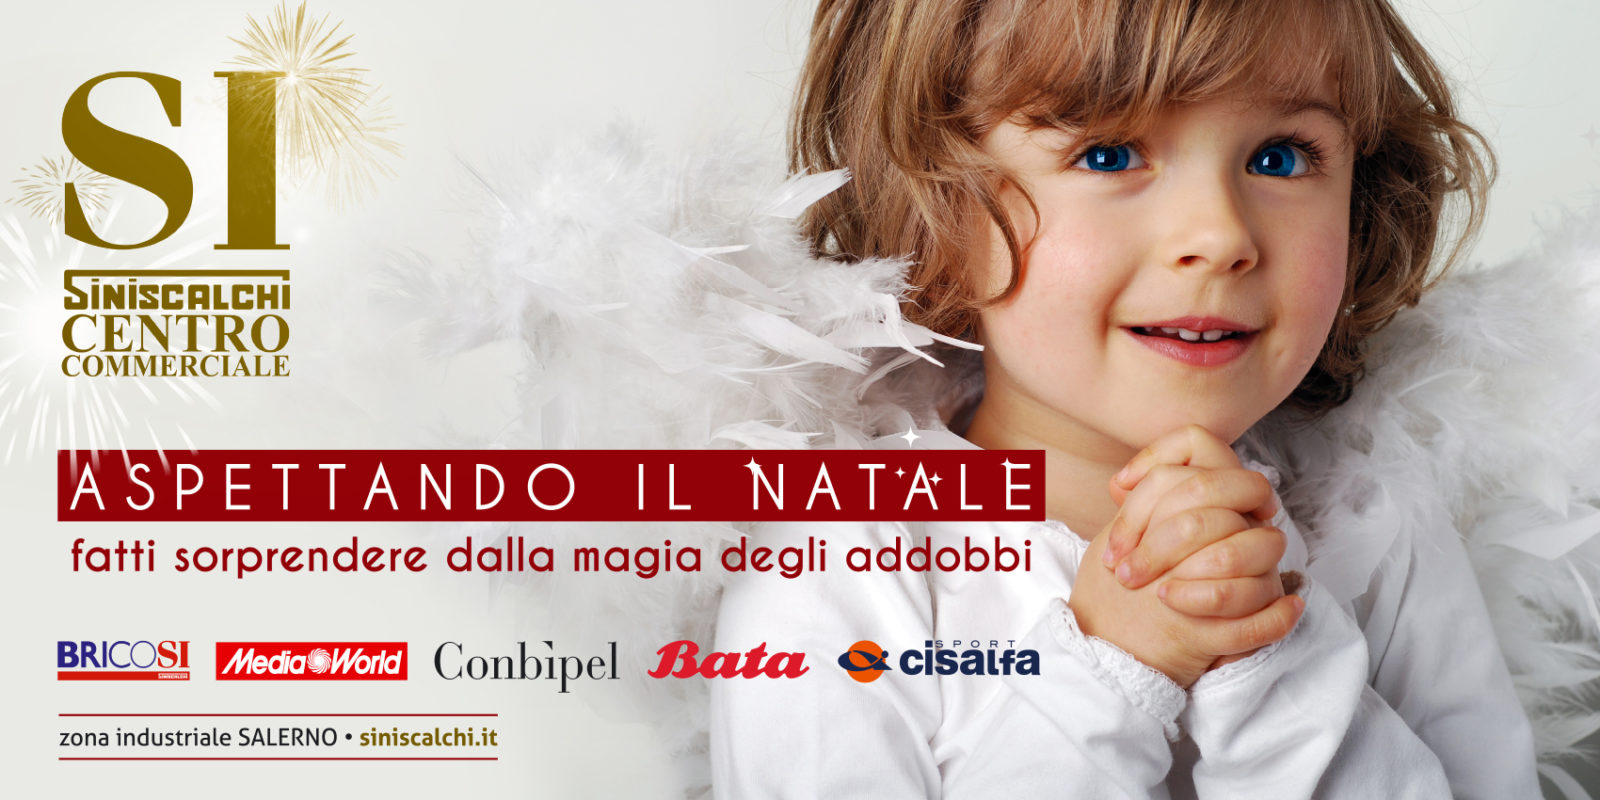 Manifesto 6x3- Siniscalchi Natale2016